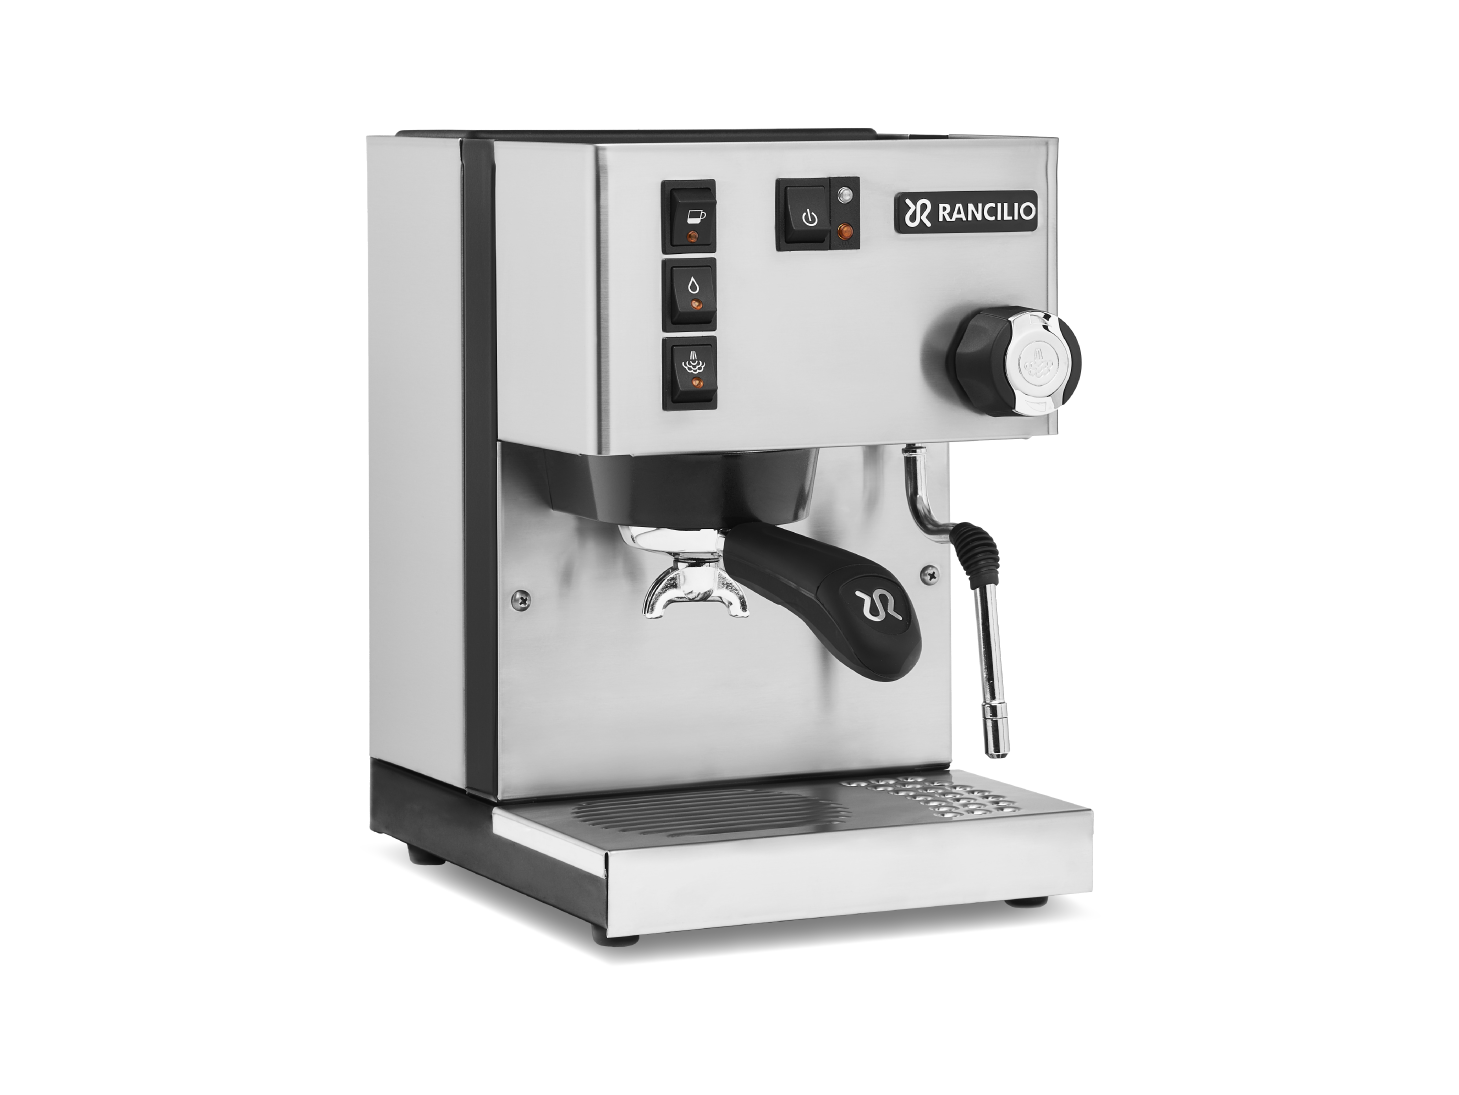 Rancilio Silvia M 2019 Update Stainless Steel Manual Espresso Machine